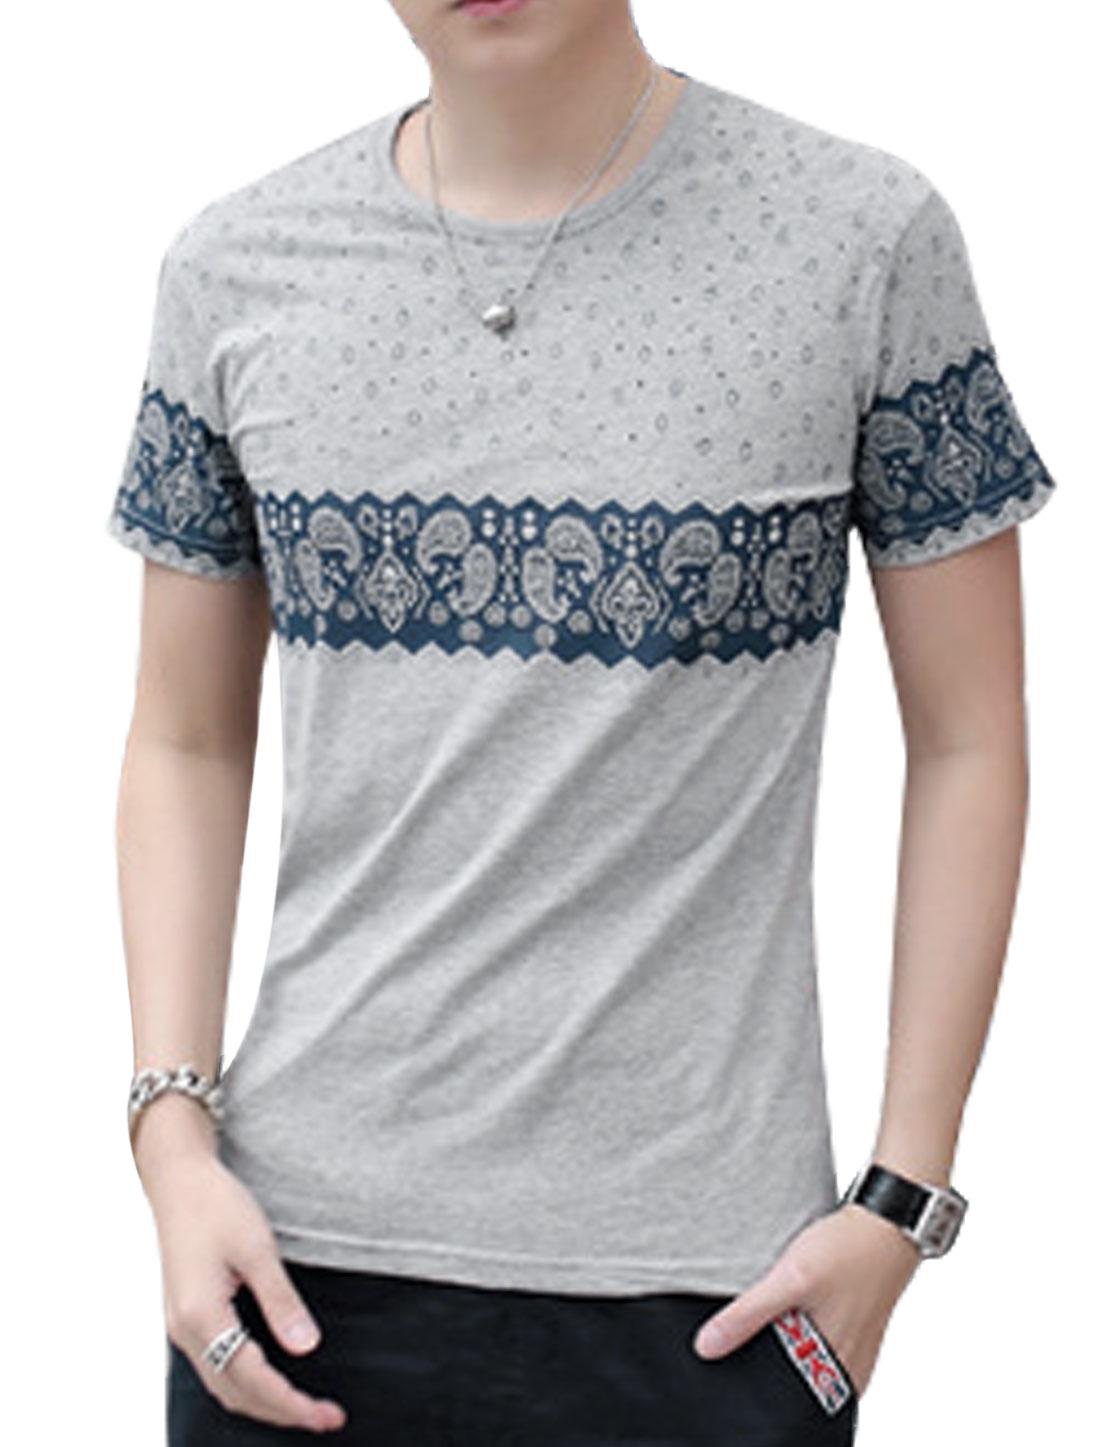 Men Short Sleeve Round Neck Paisleys Print Casual T-Shirt Light Gray S